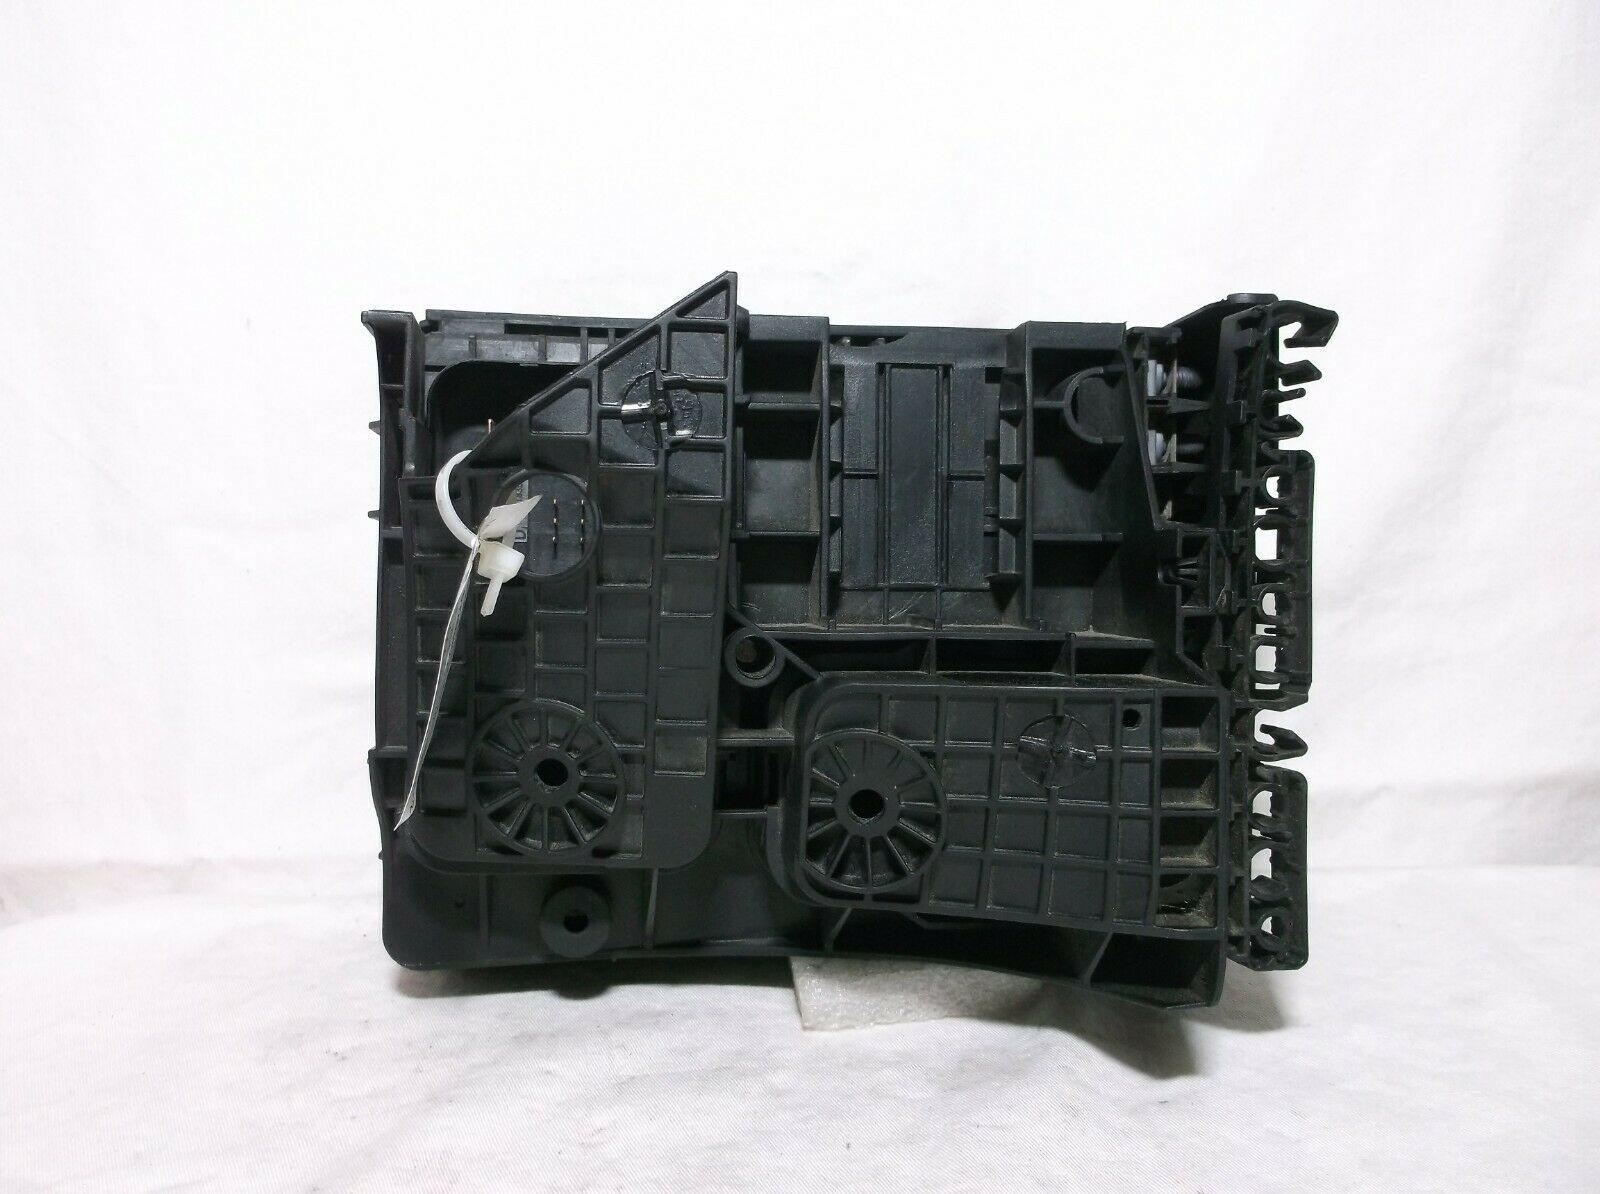 10-11-12-13-14 Volkswagen  Vw Golf Gti   Engine Bay Fuse   Relay   Box